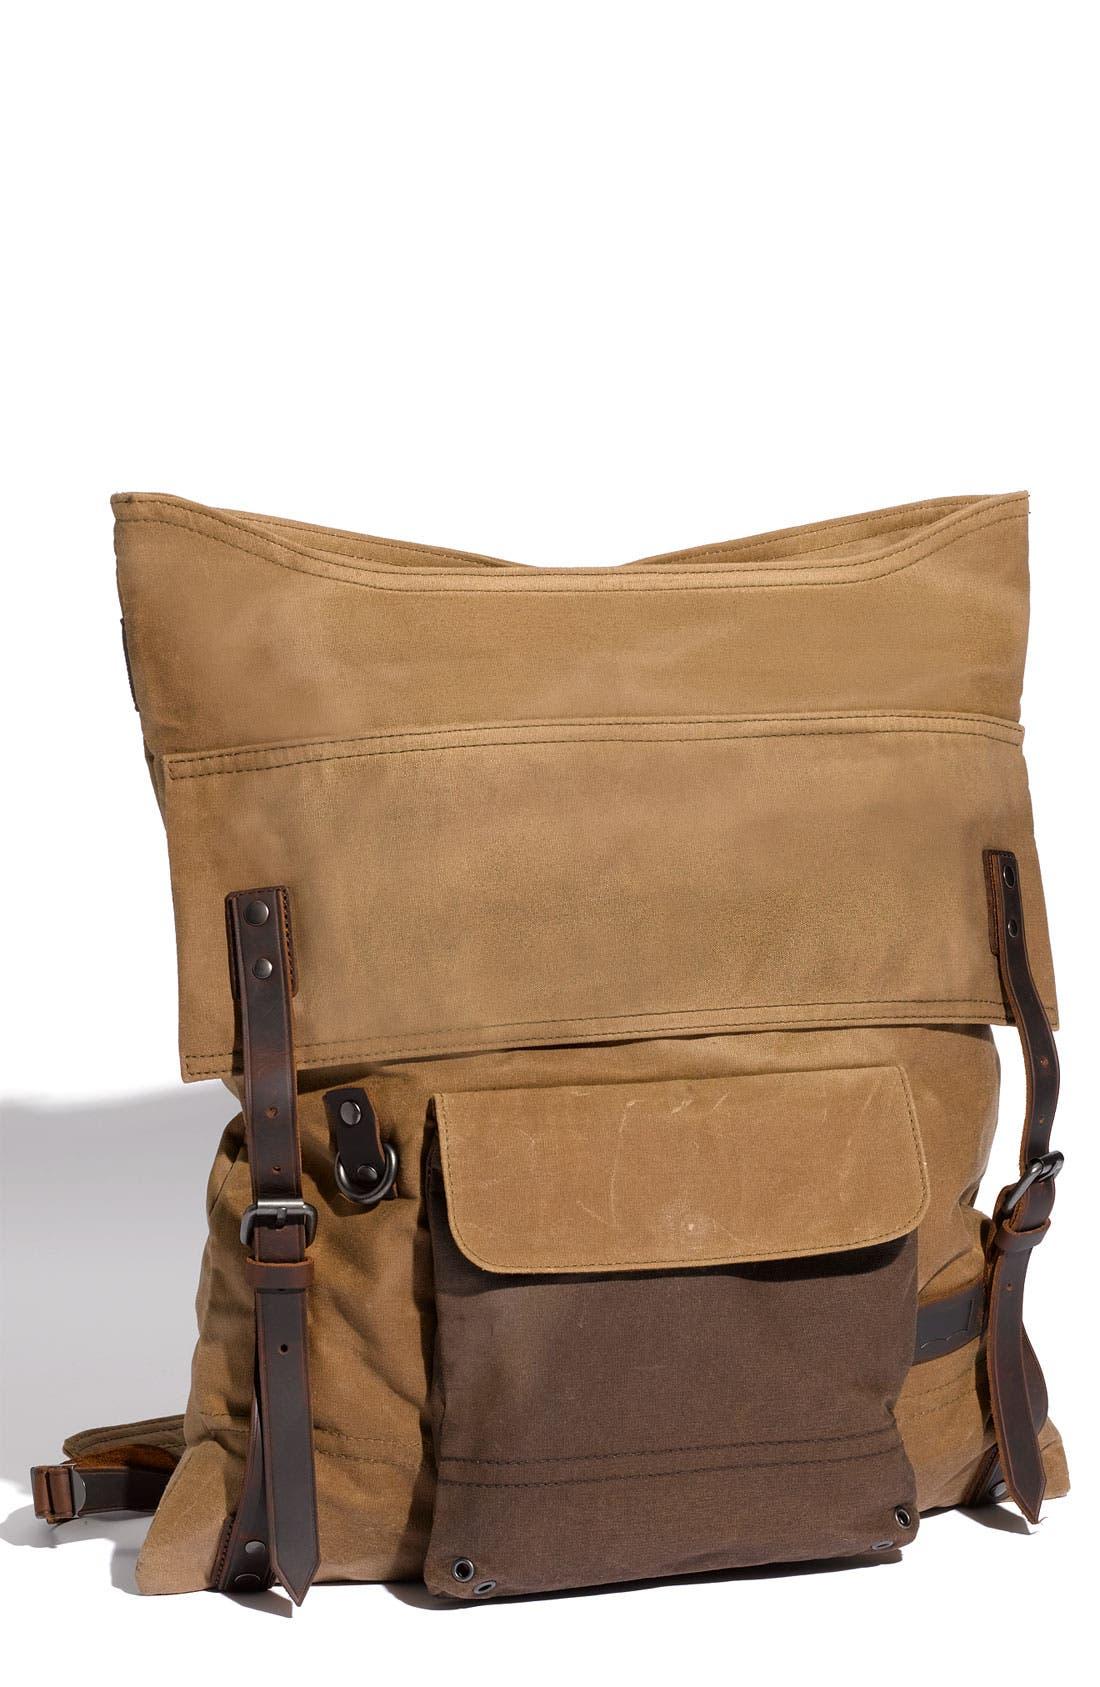 Main Image - Levi's 'River Rock' Backpack